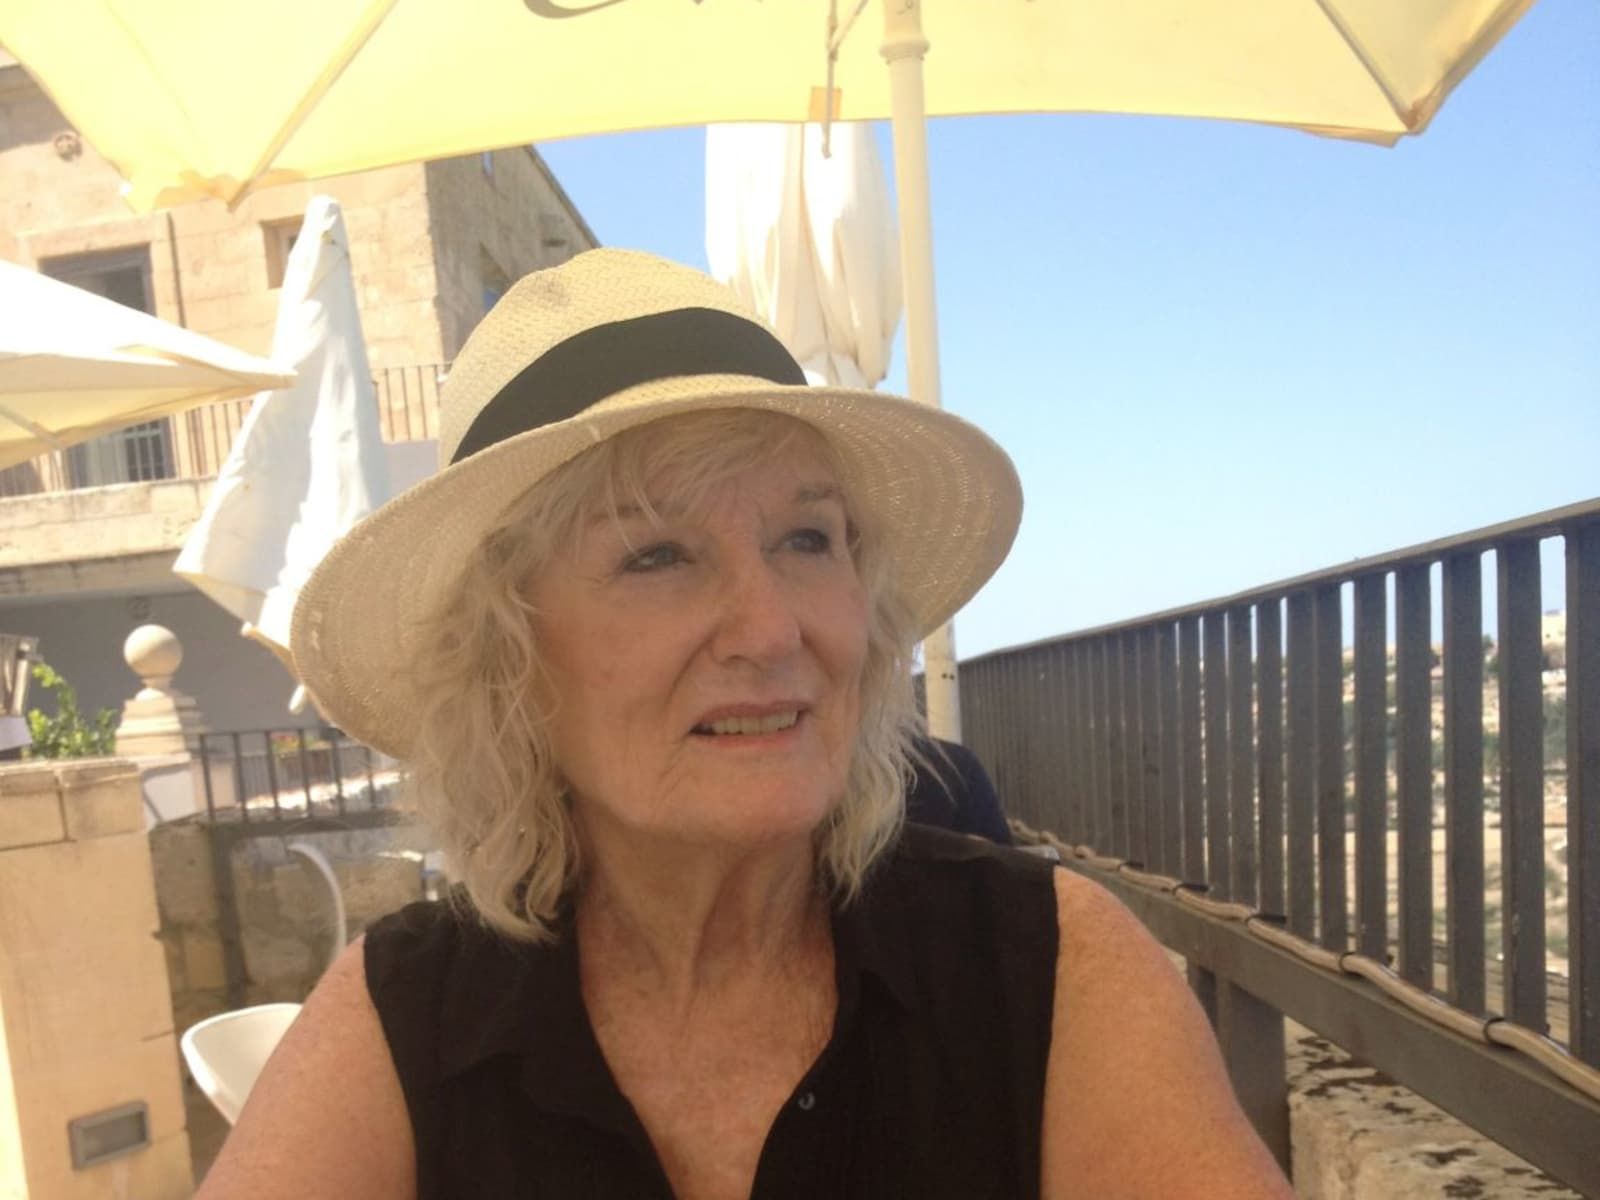 Gail from Toronto, Ontario, Canada